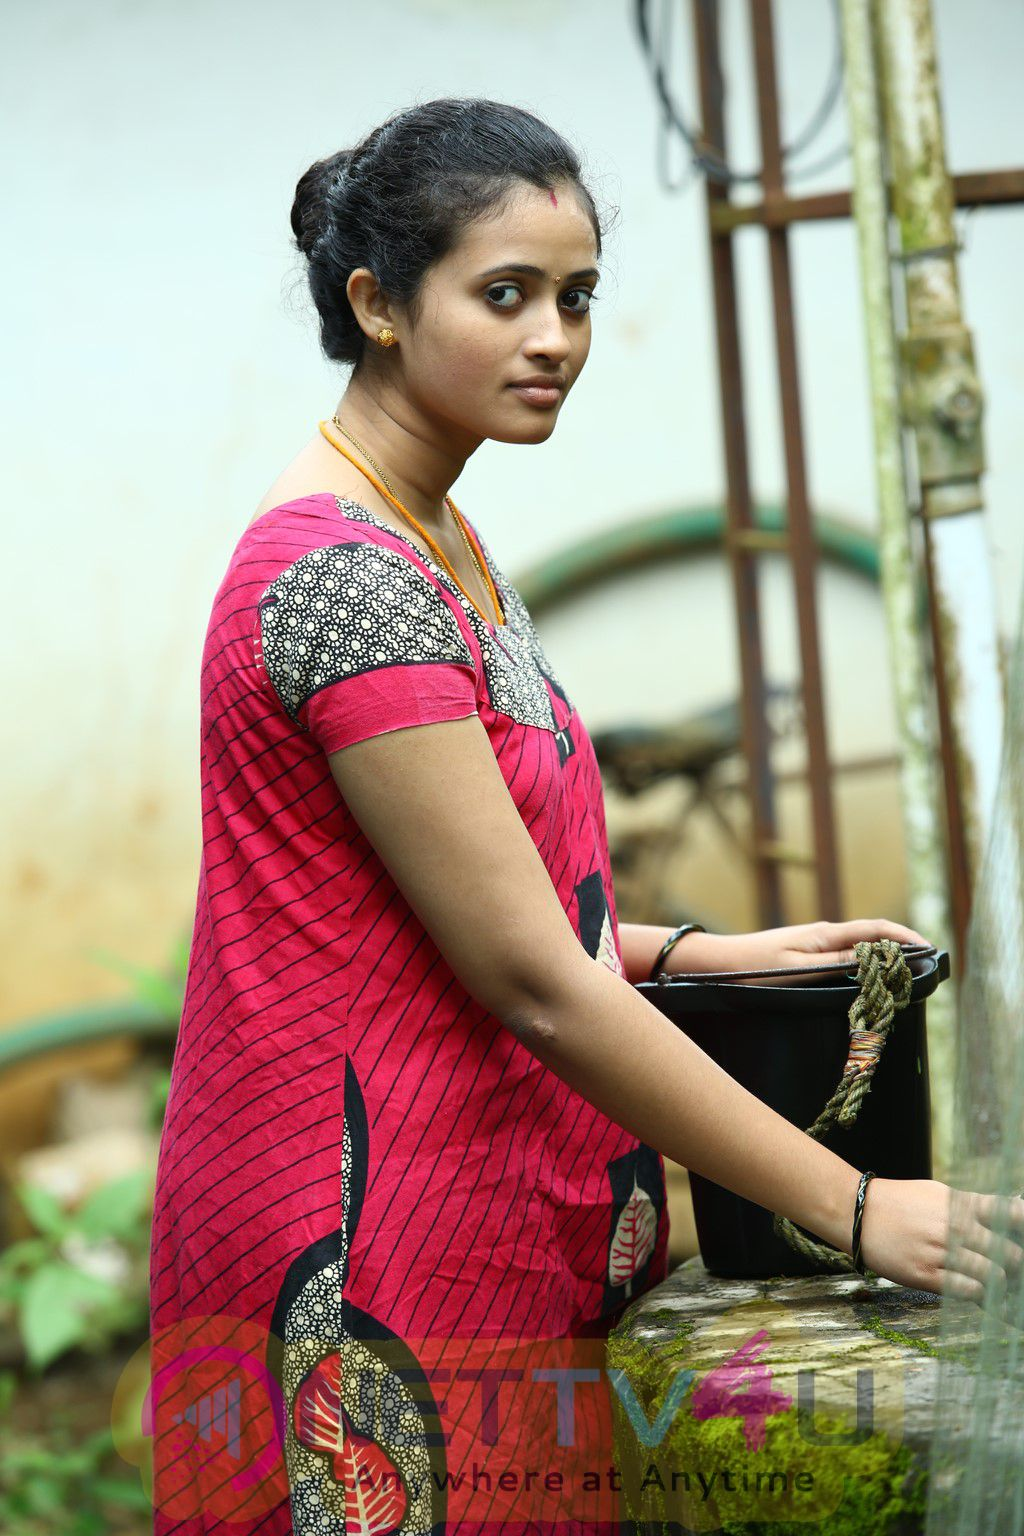 Oru Tharam Udhayamagirathu Tamil Movie Stills And Posters Tamil Gallery